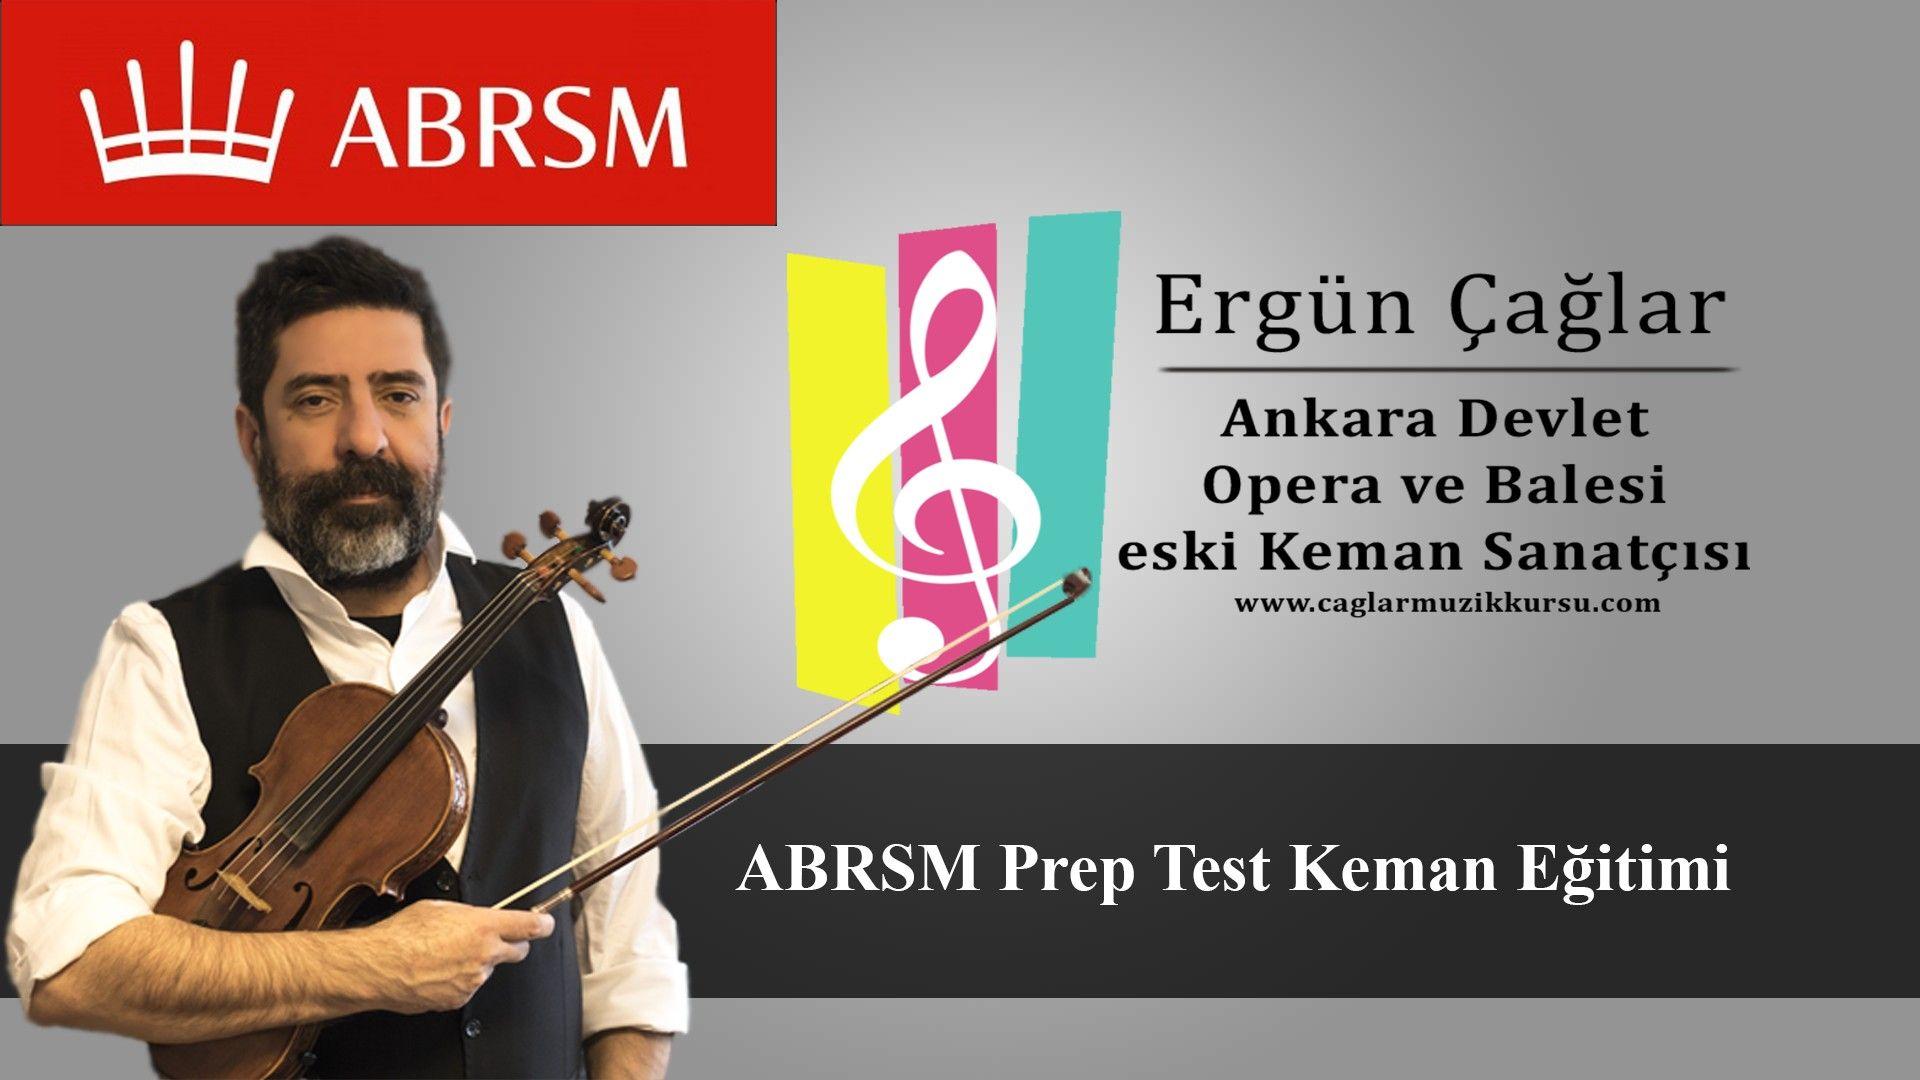 ABRSM Prep Test #Keman Eğitimi